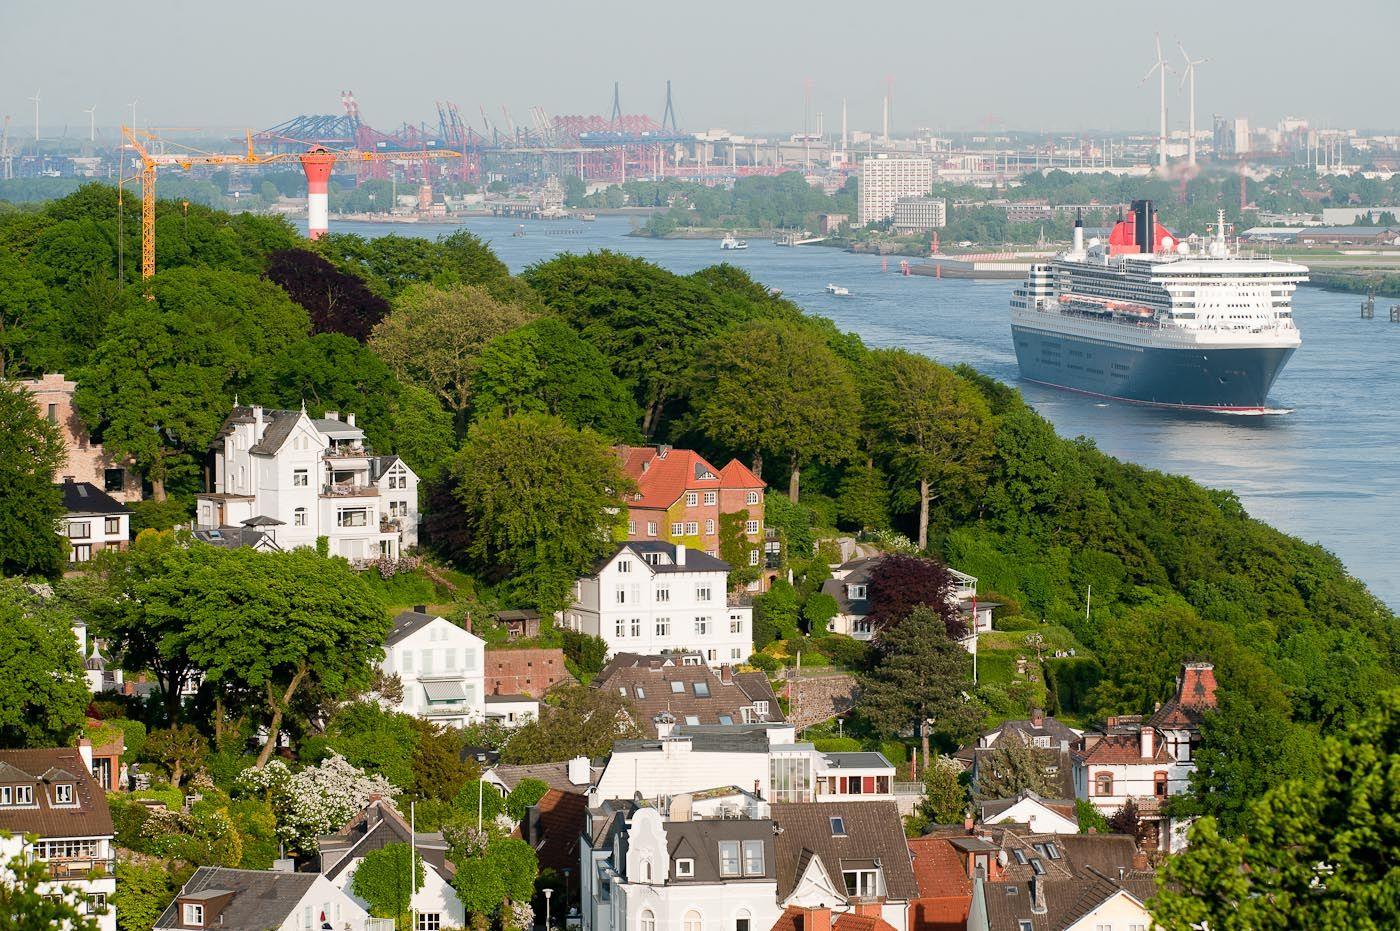 Pin Von Pavla Hajkova Auf Pavla In 2020 Hamburg Reisen Hamburg